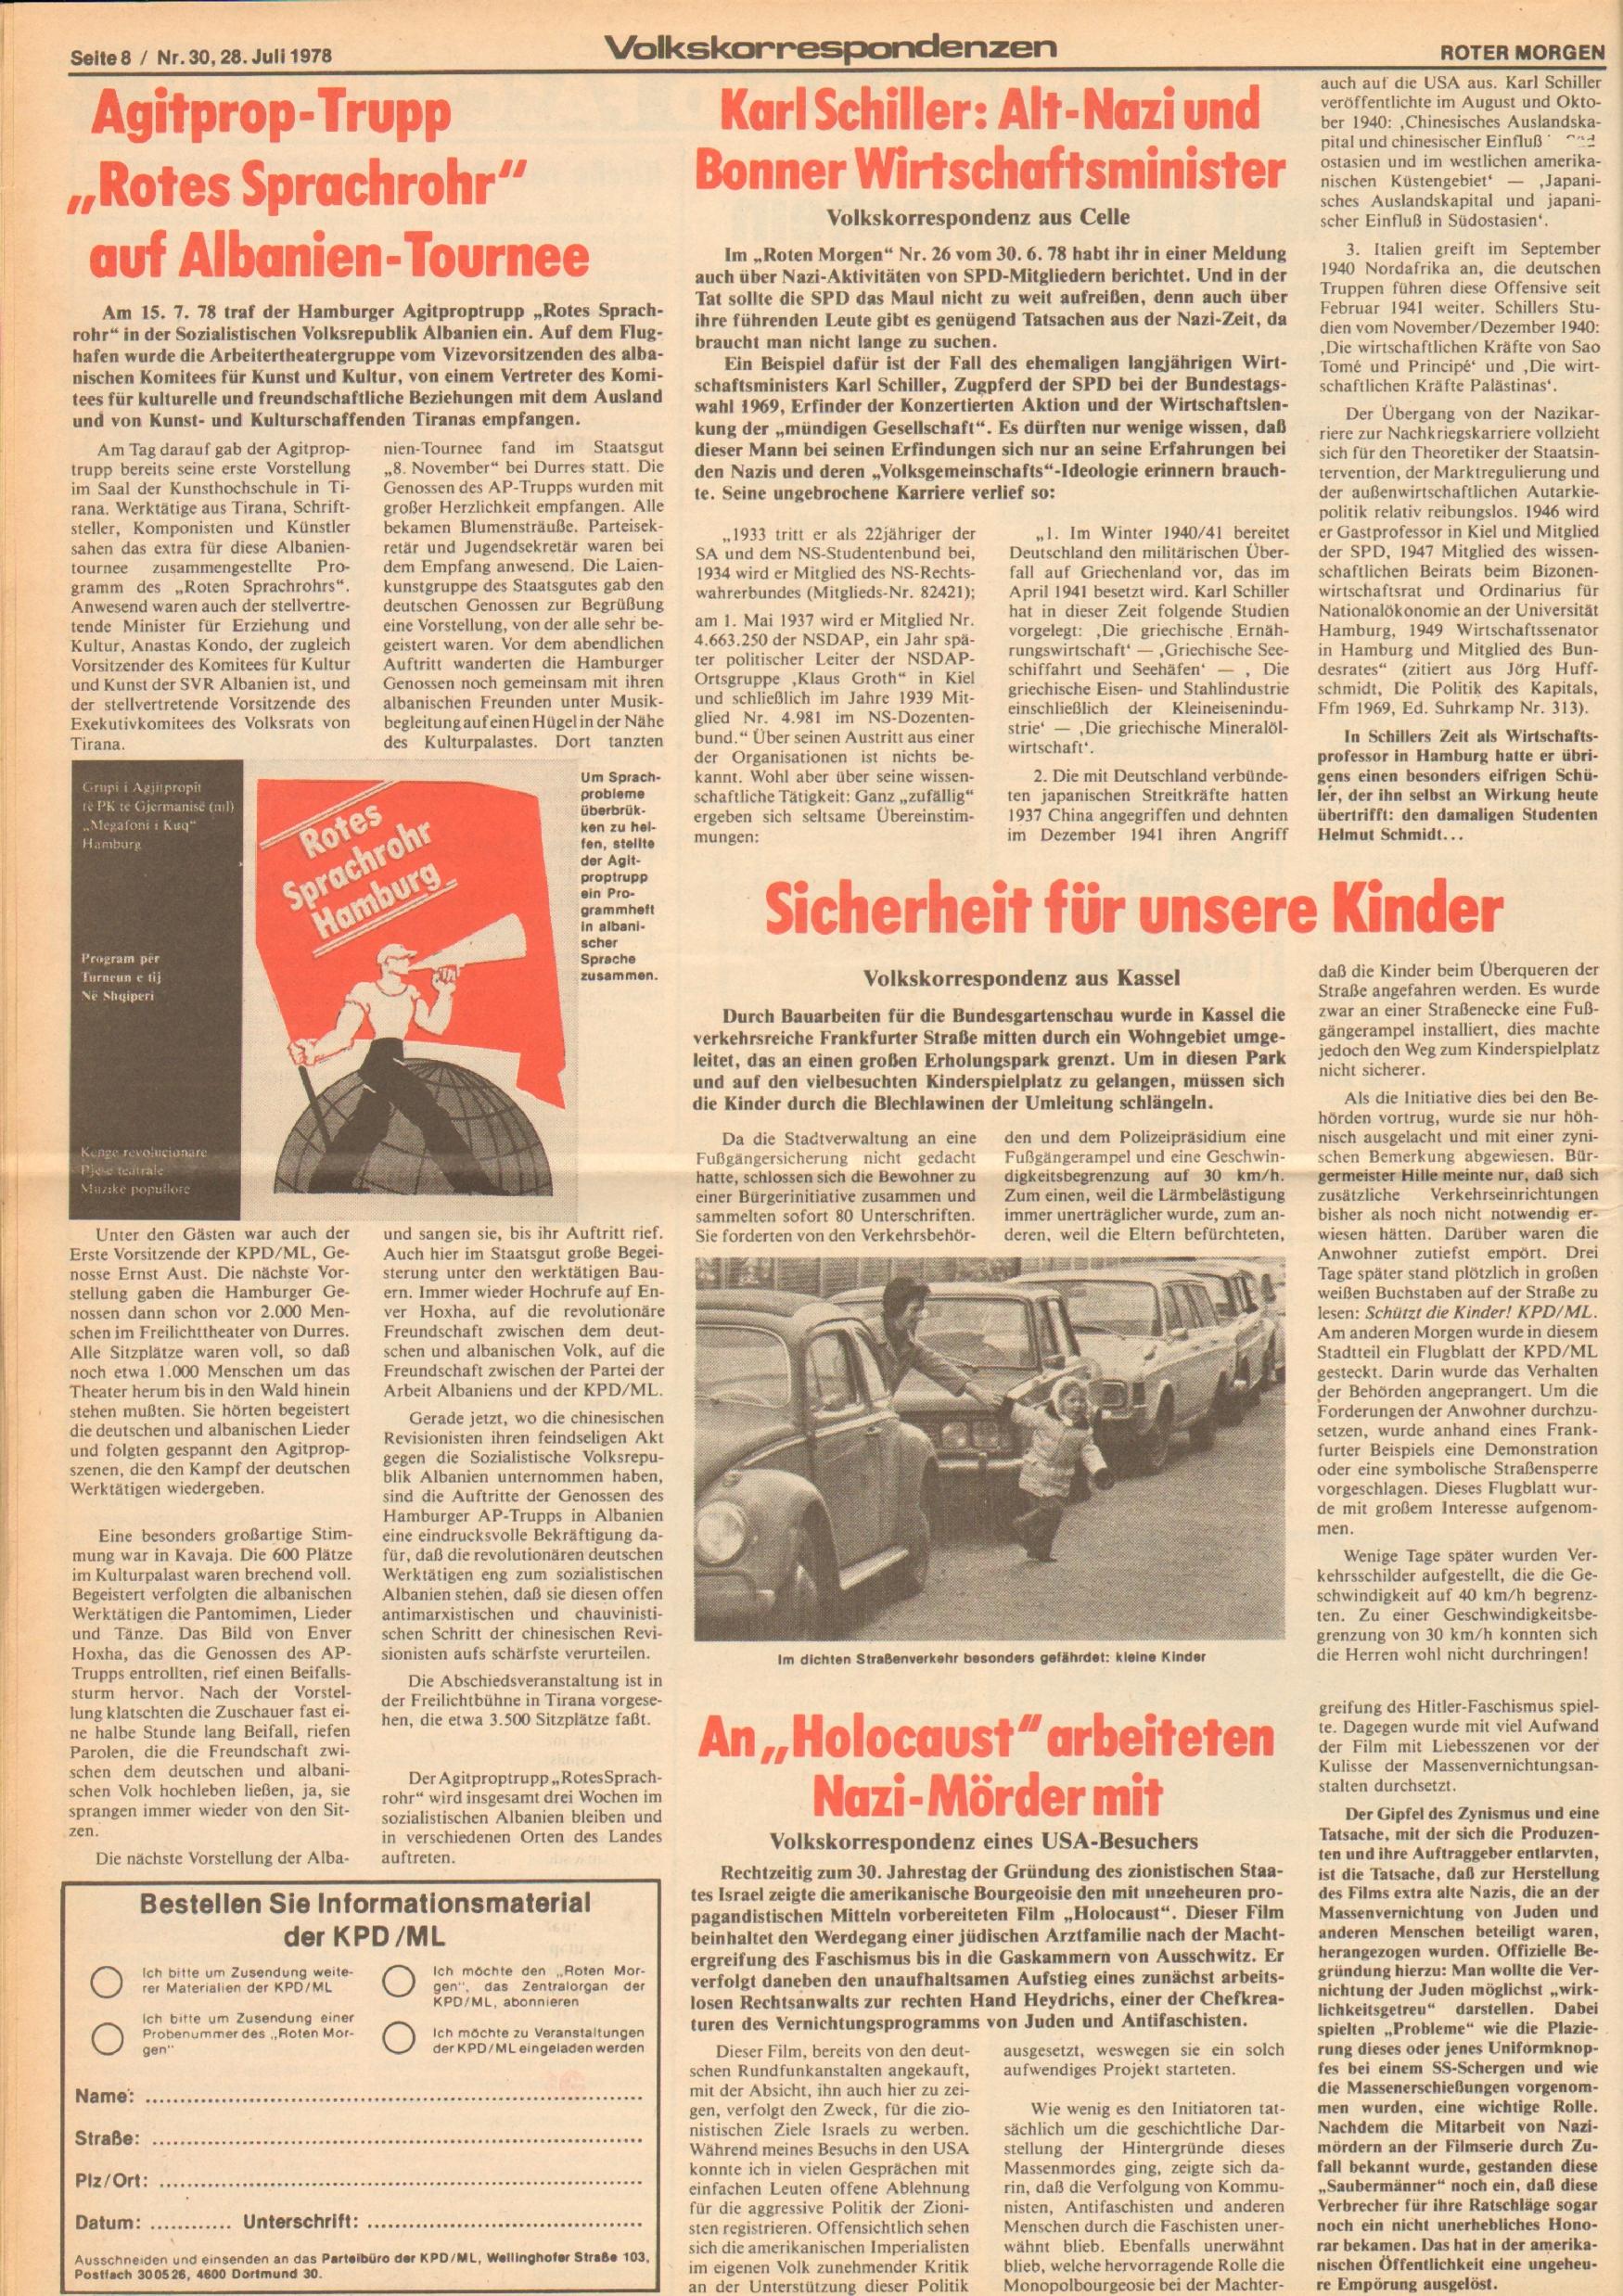 Roter Morgen, 12. Jg., 28. Juli 1978, Nr. 30, Seite 8